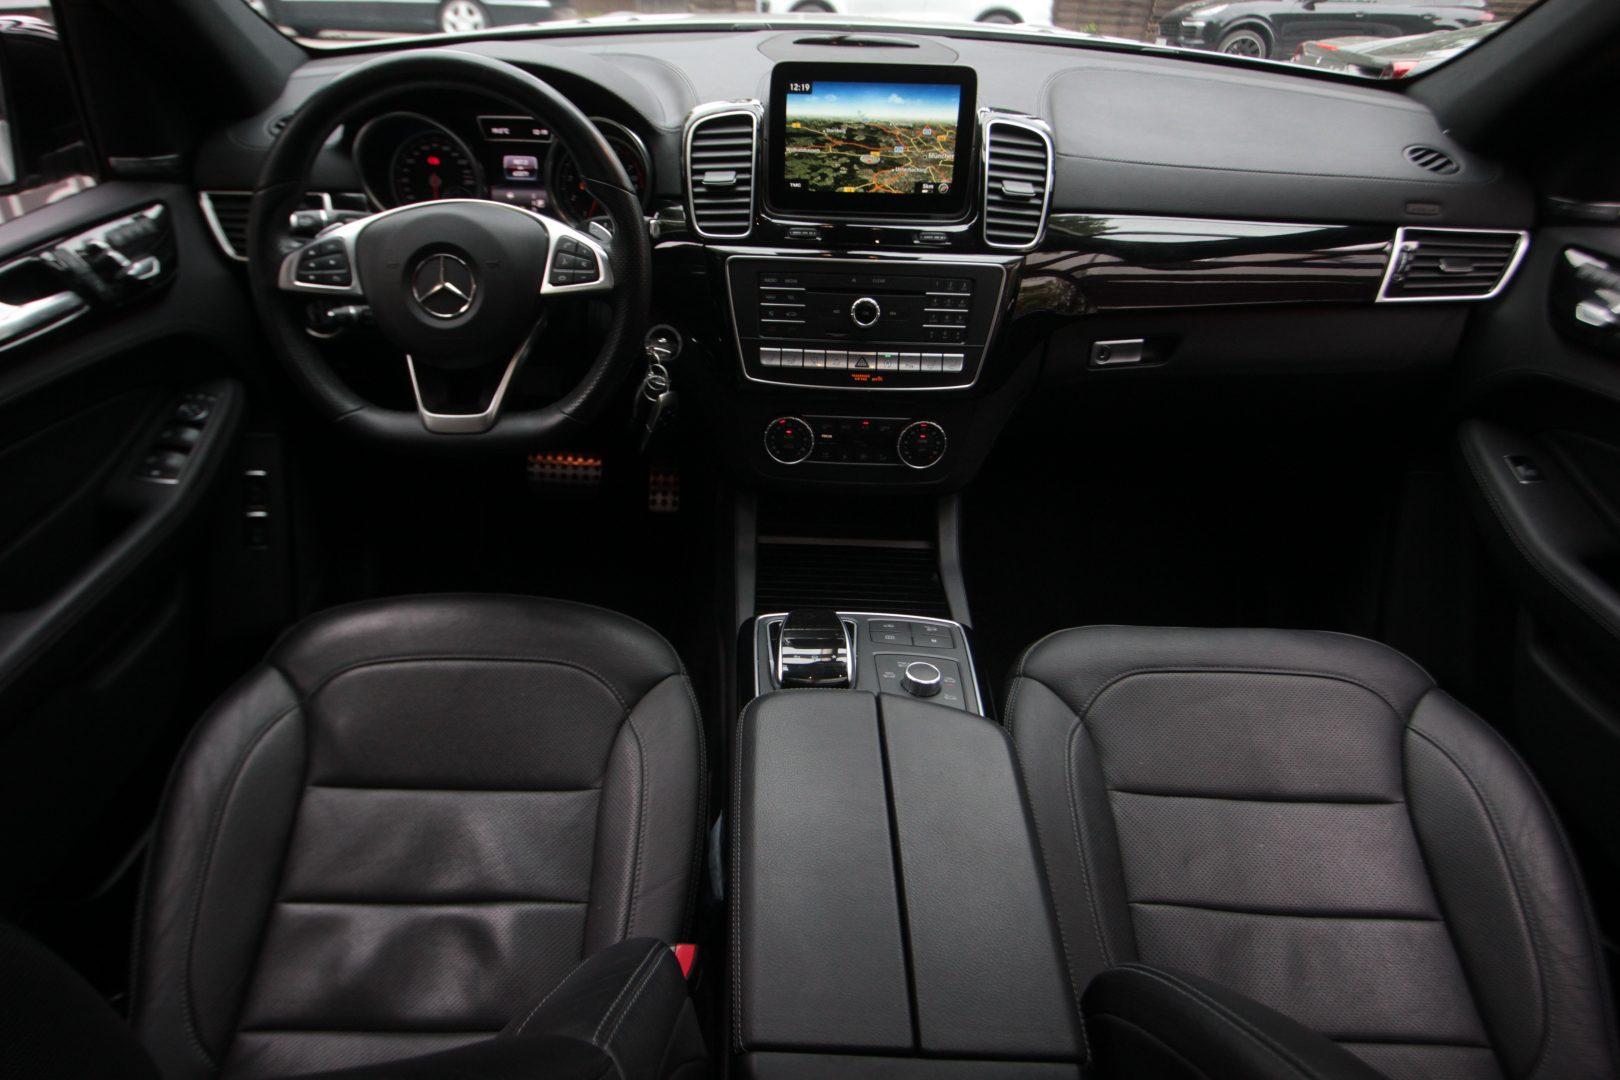 AIL Mercedes-Benz GLE 450 AMG 4Matic 5